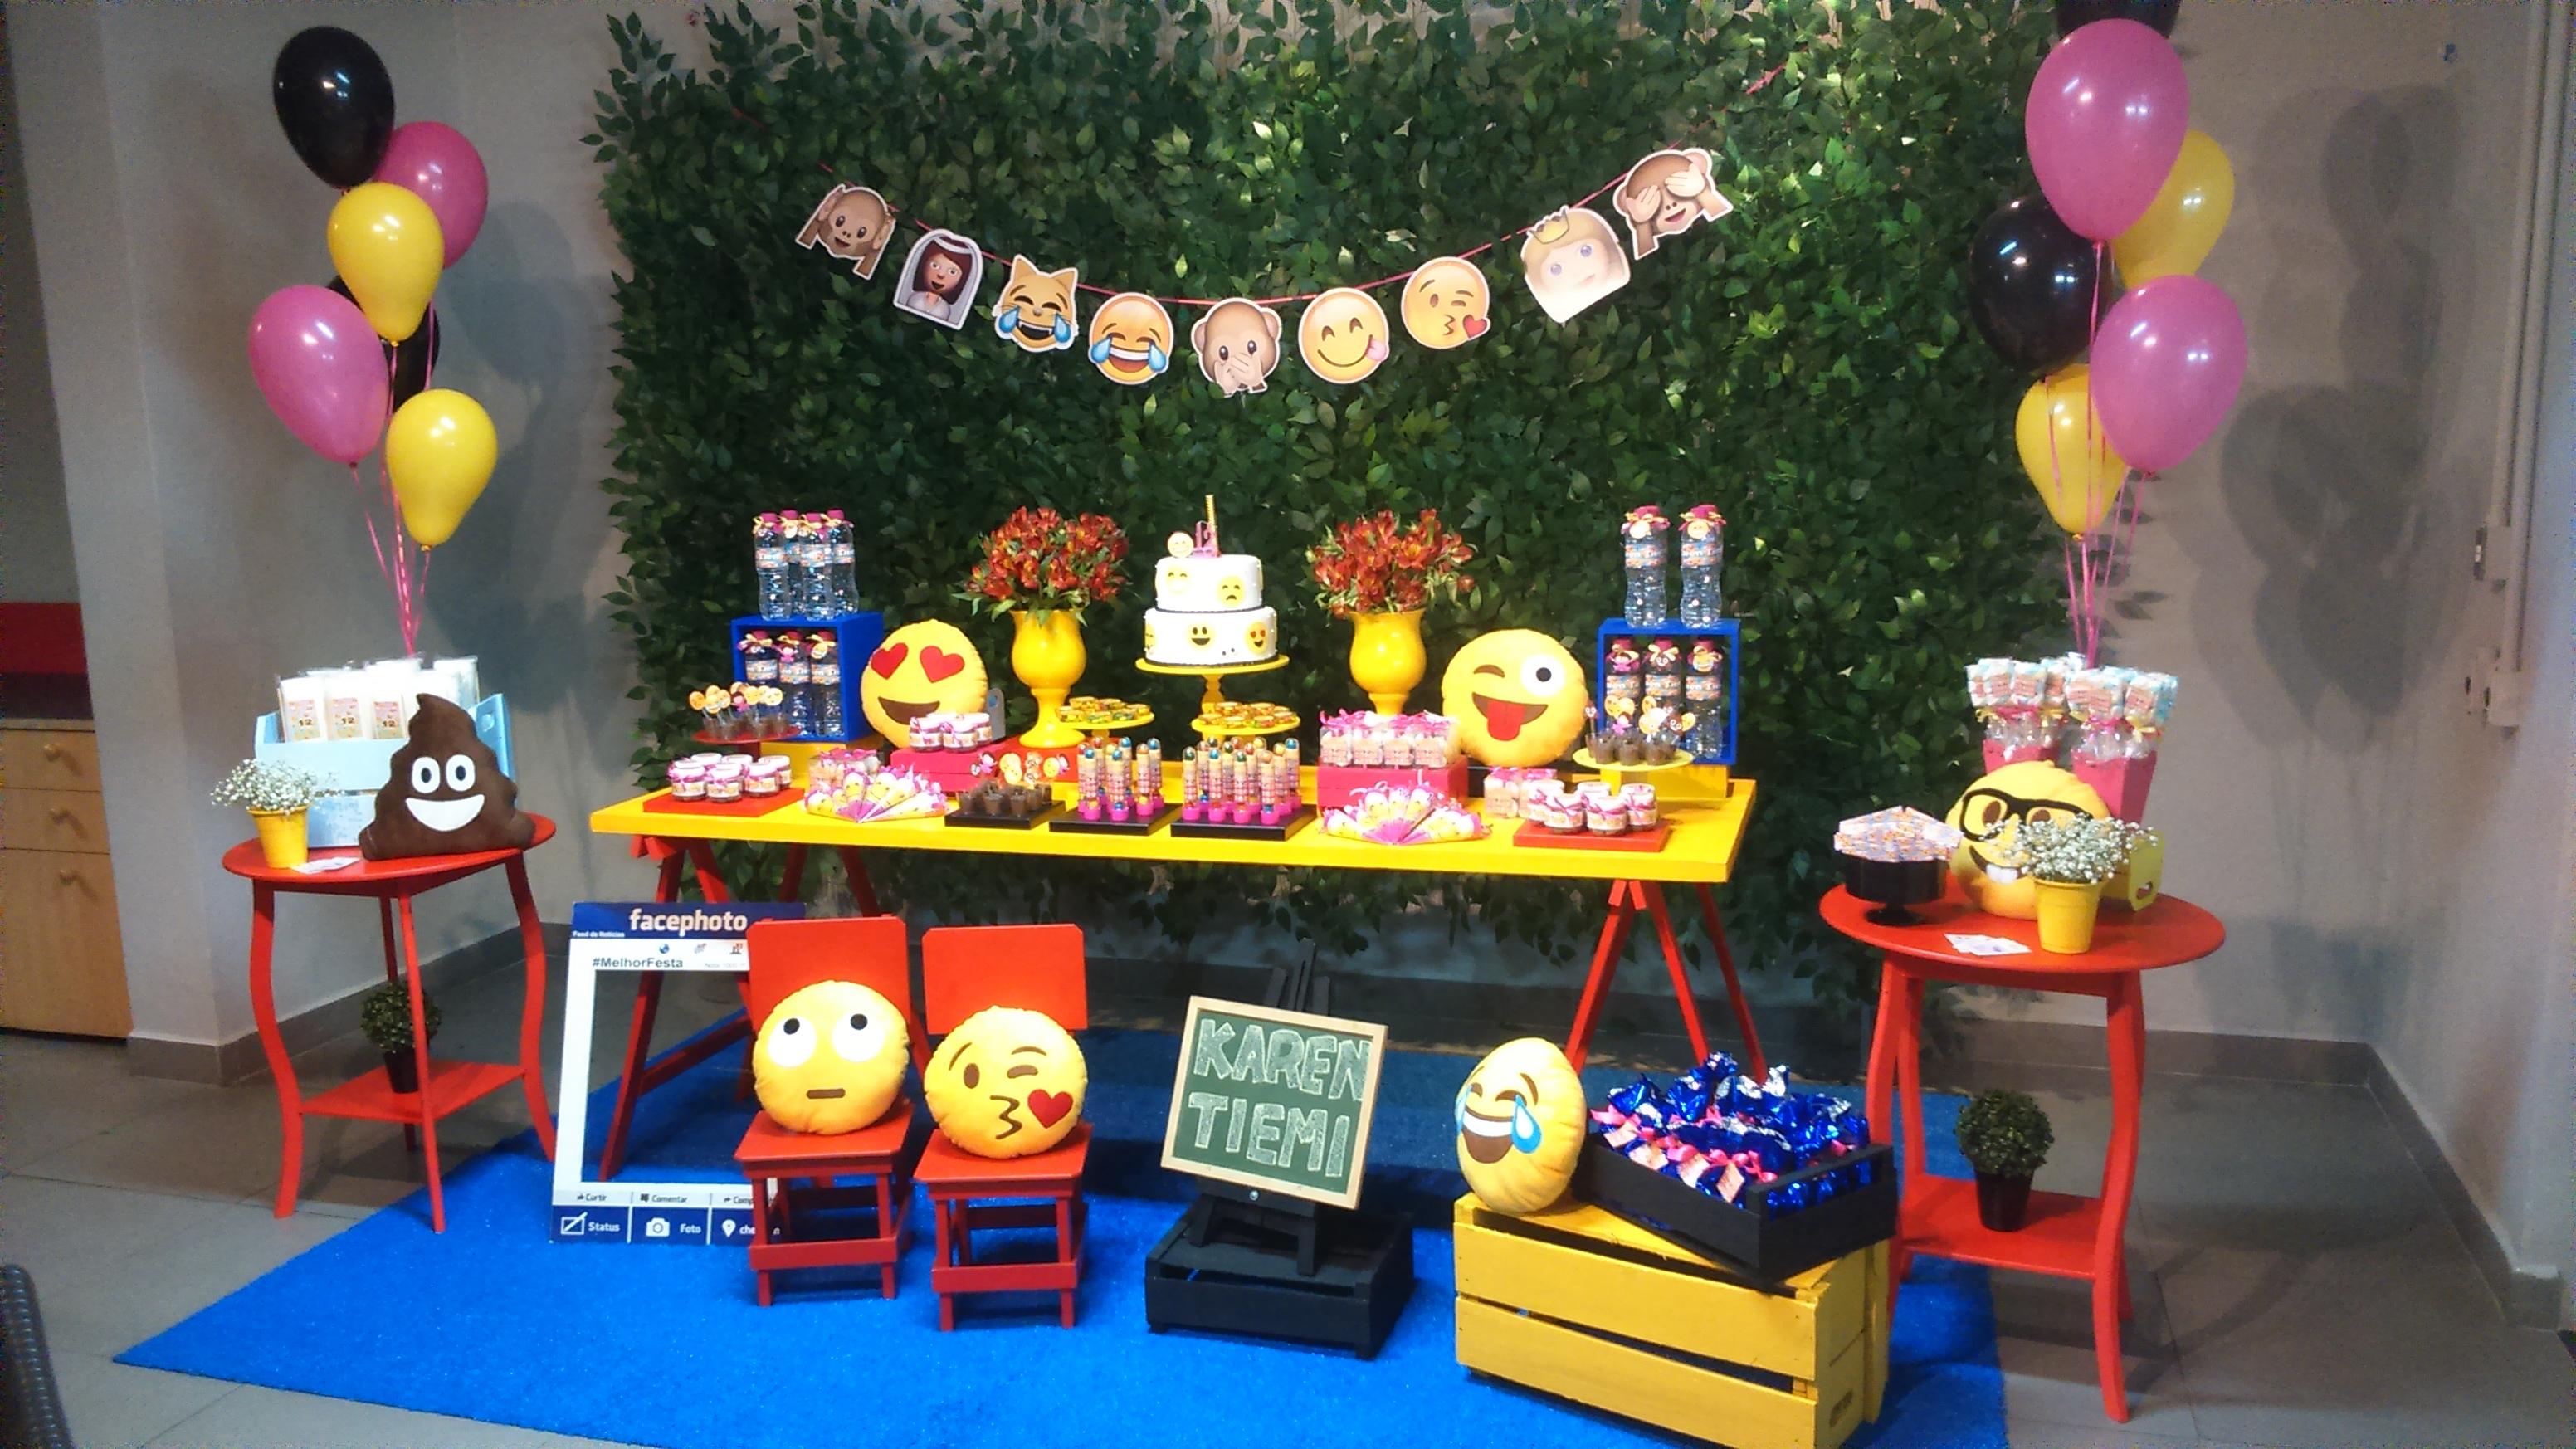 decoracao-festa-emotions-emoji-facebook.jpg